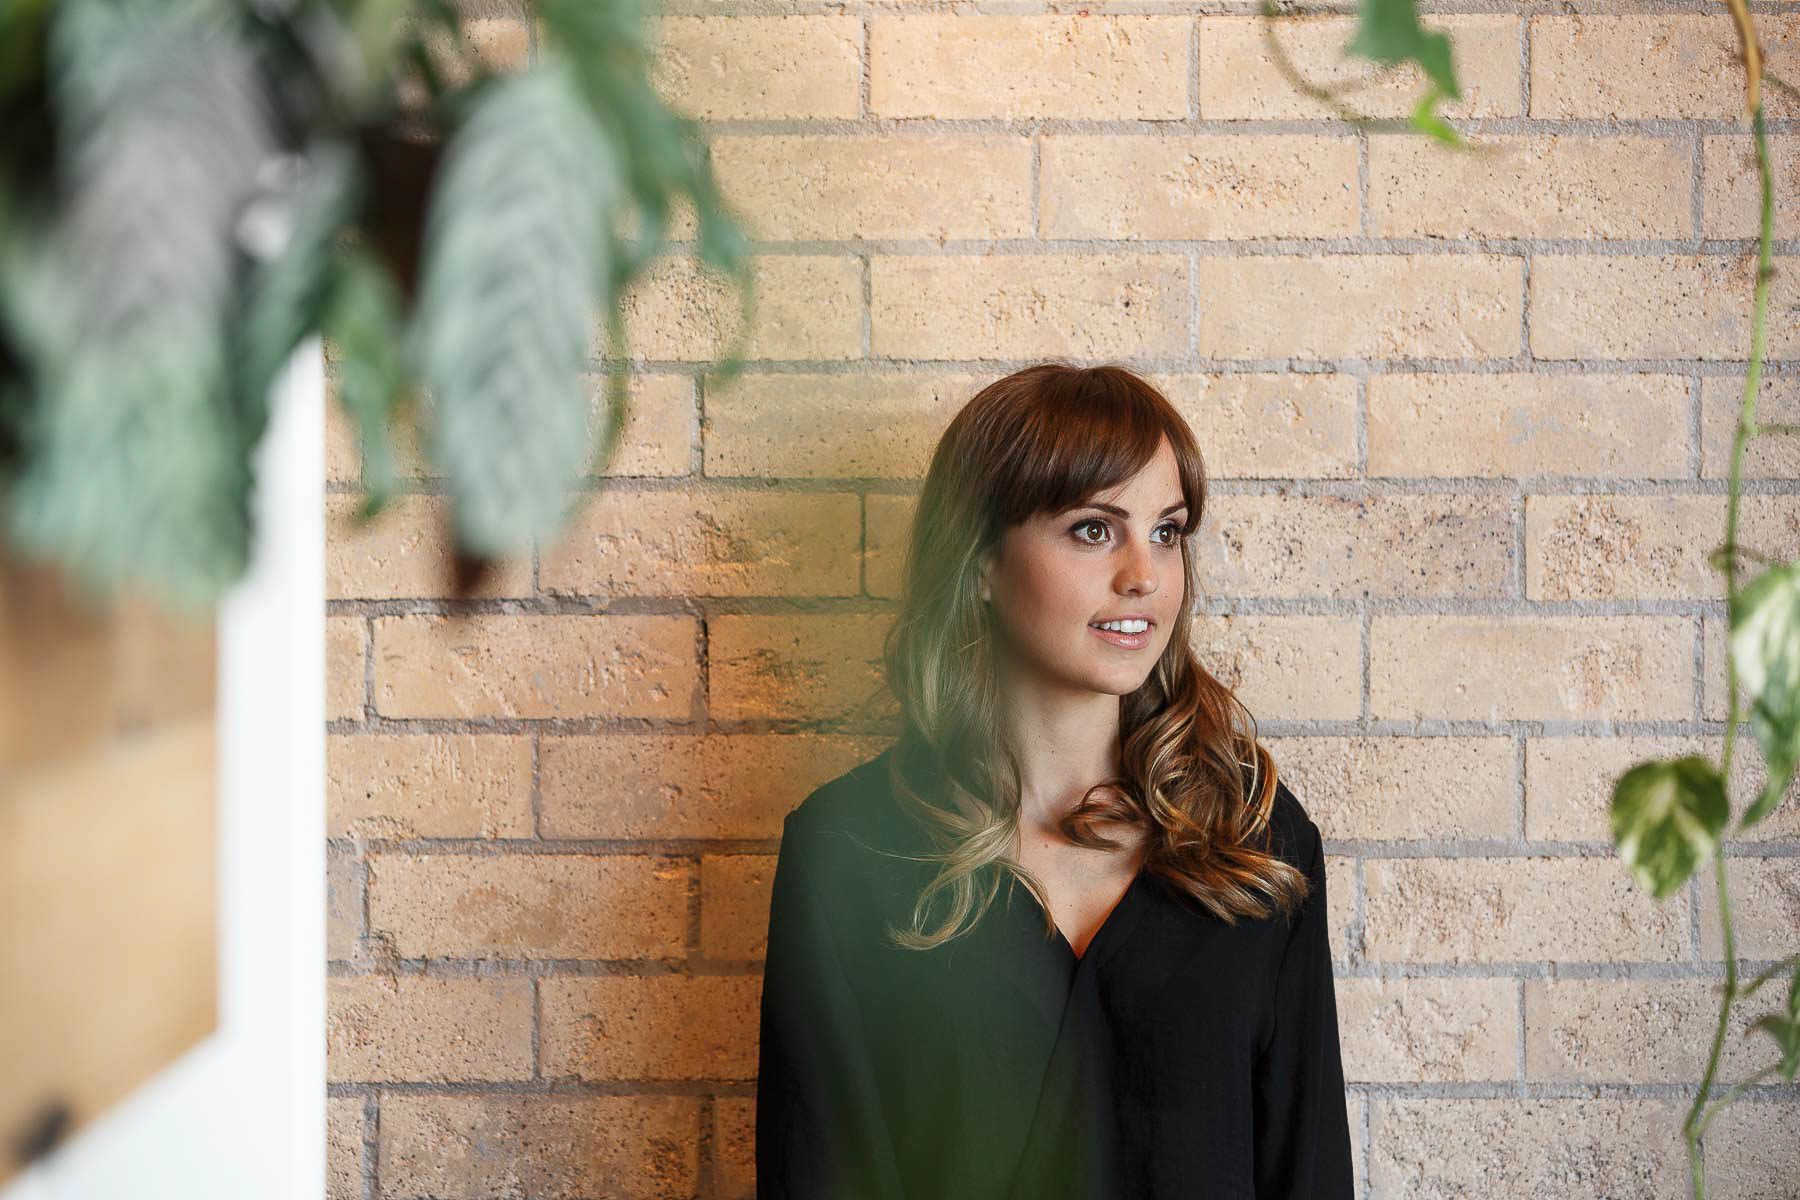 artwork-agency-portraits-claudio-kirac-kaylene-langford-startup-creative-1.jpg